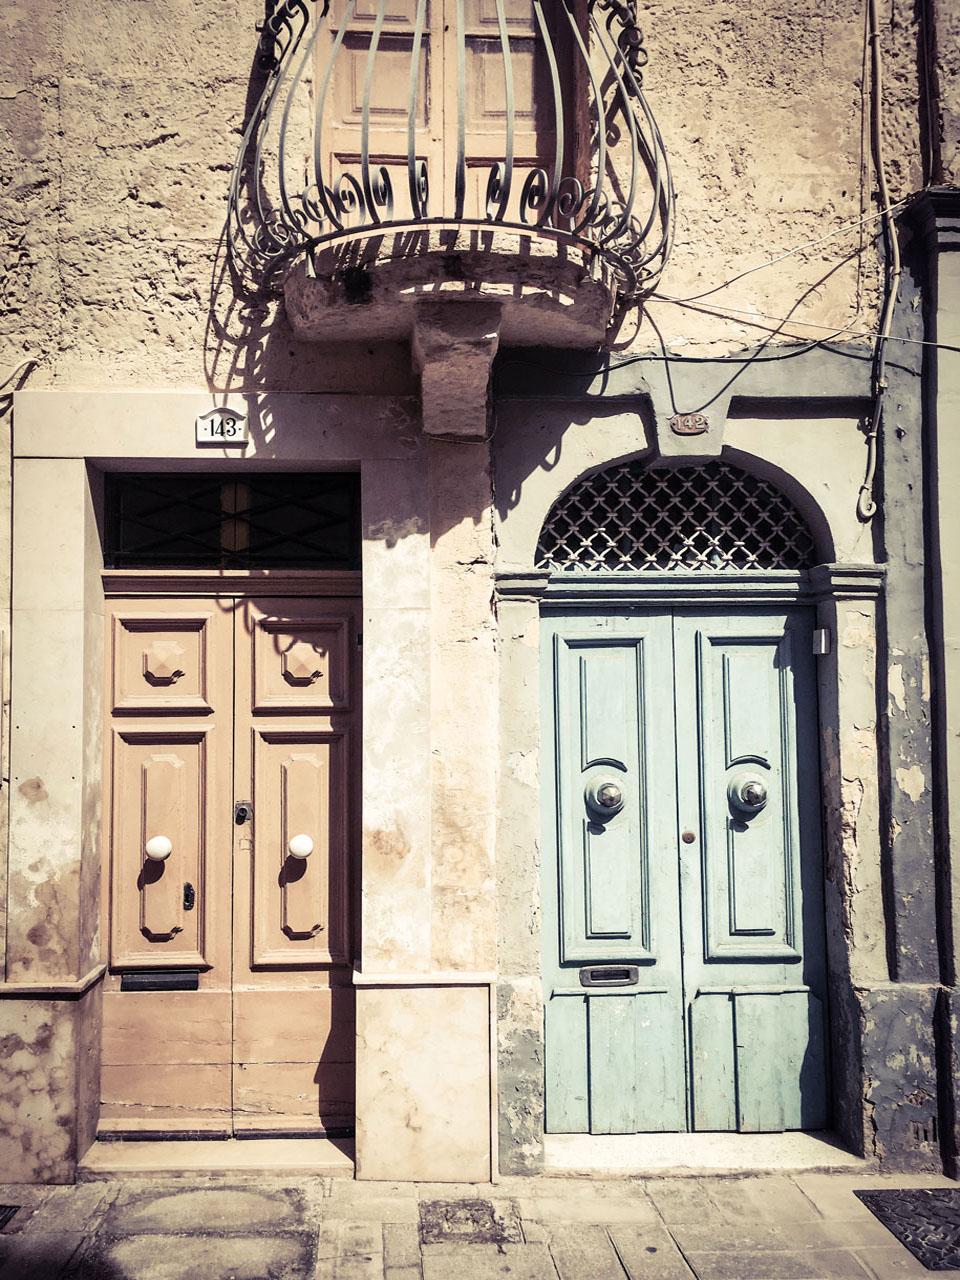 disappearingMalta - Two doors and balcony, Vjal il-Labour, Naxxar, Malta ©Helen Jones-Florio photography prints